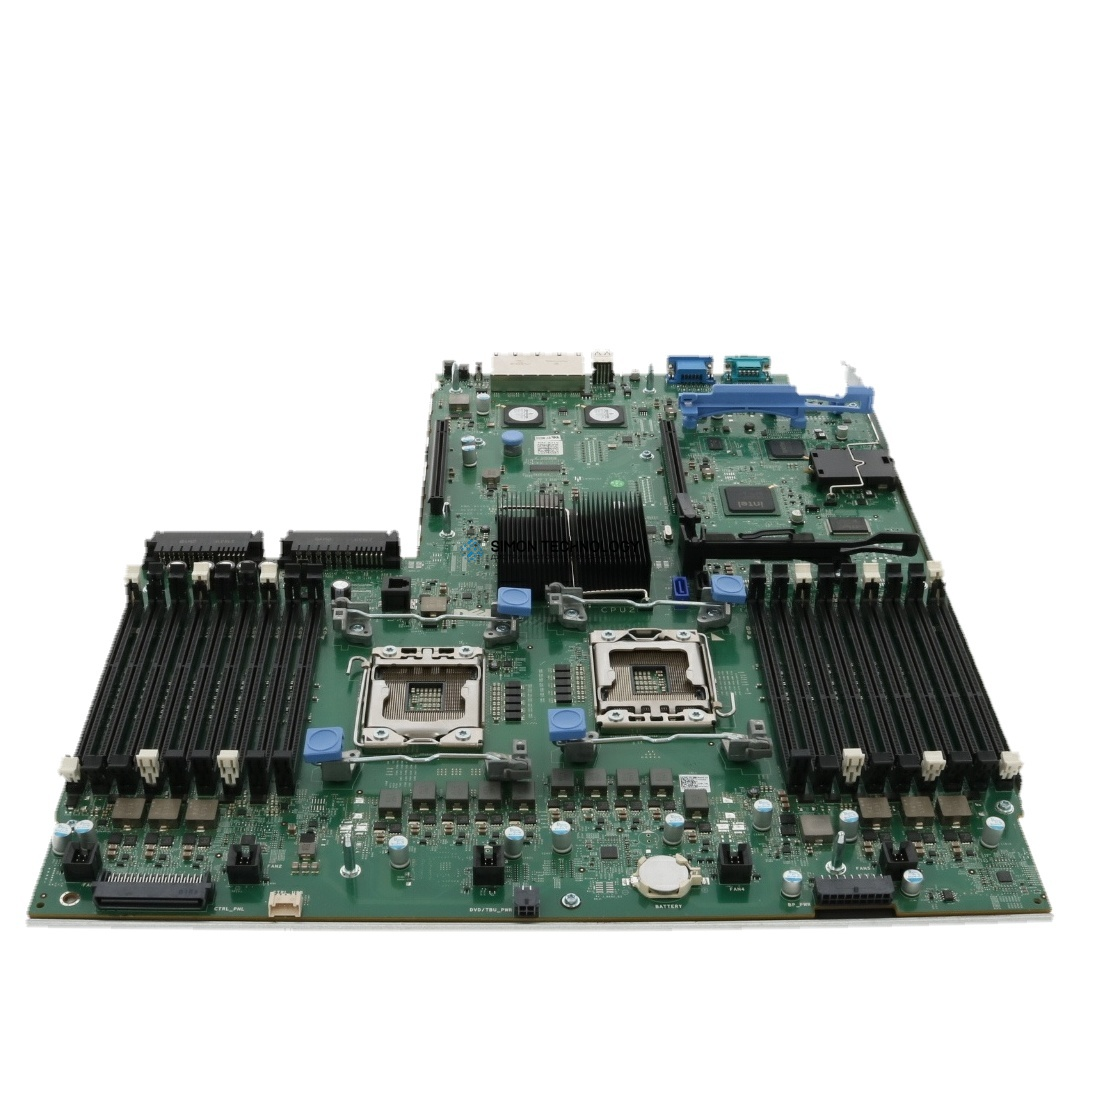 Материнская плата Dell PowerEdge 2.5x8 YDJK3 Ask for custom qoute (R710-SFF-8-YDJK3)